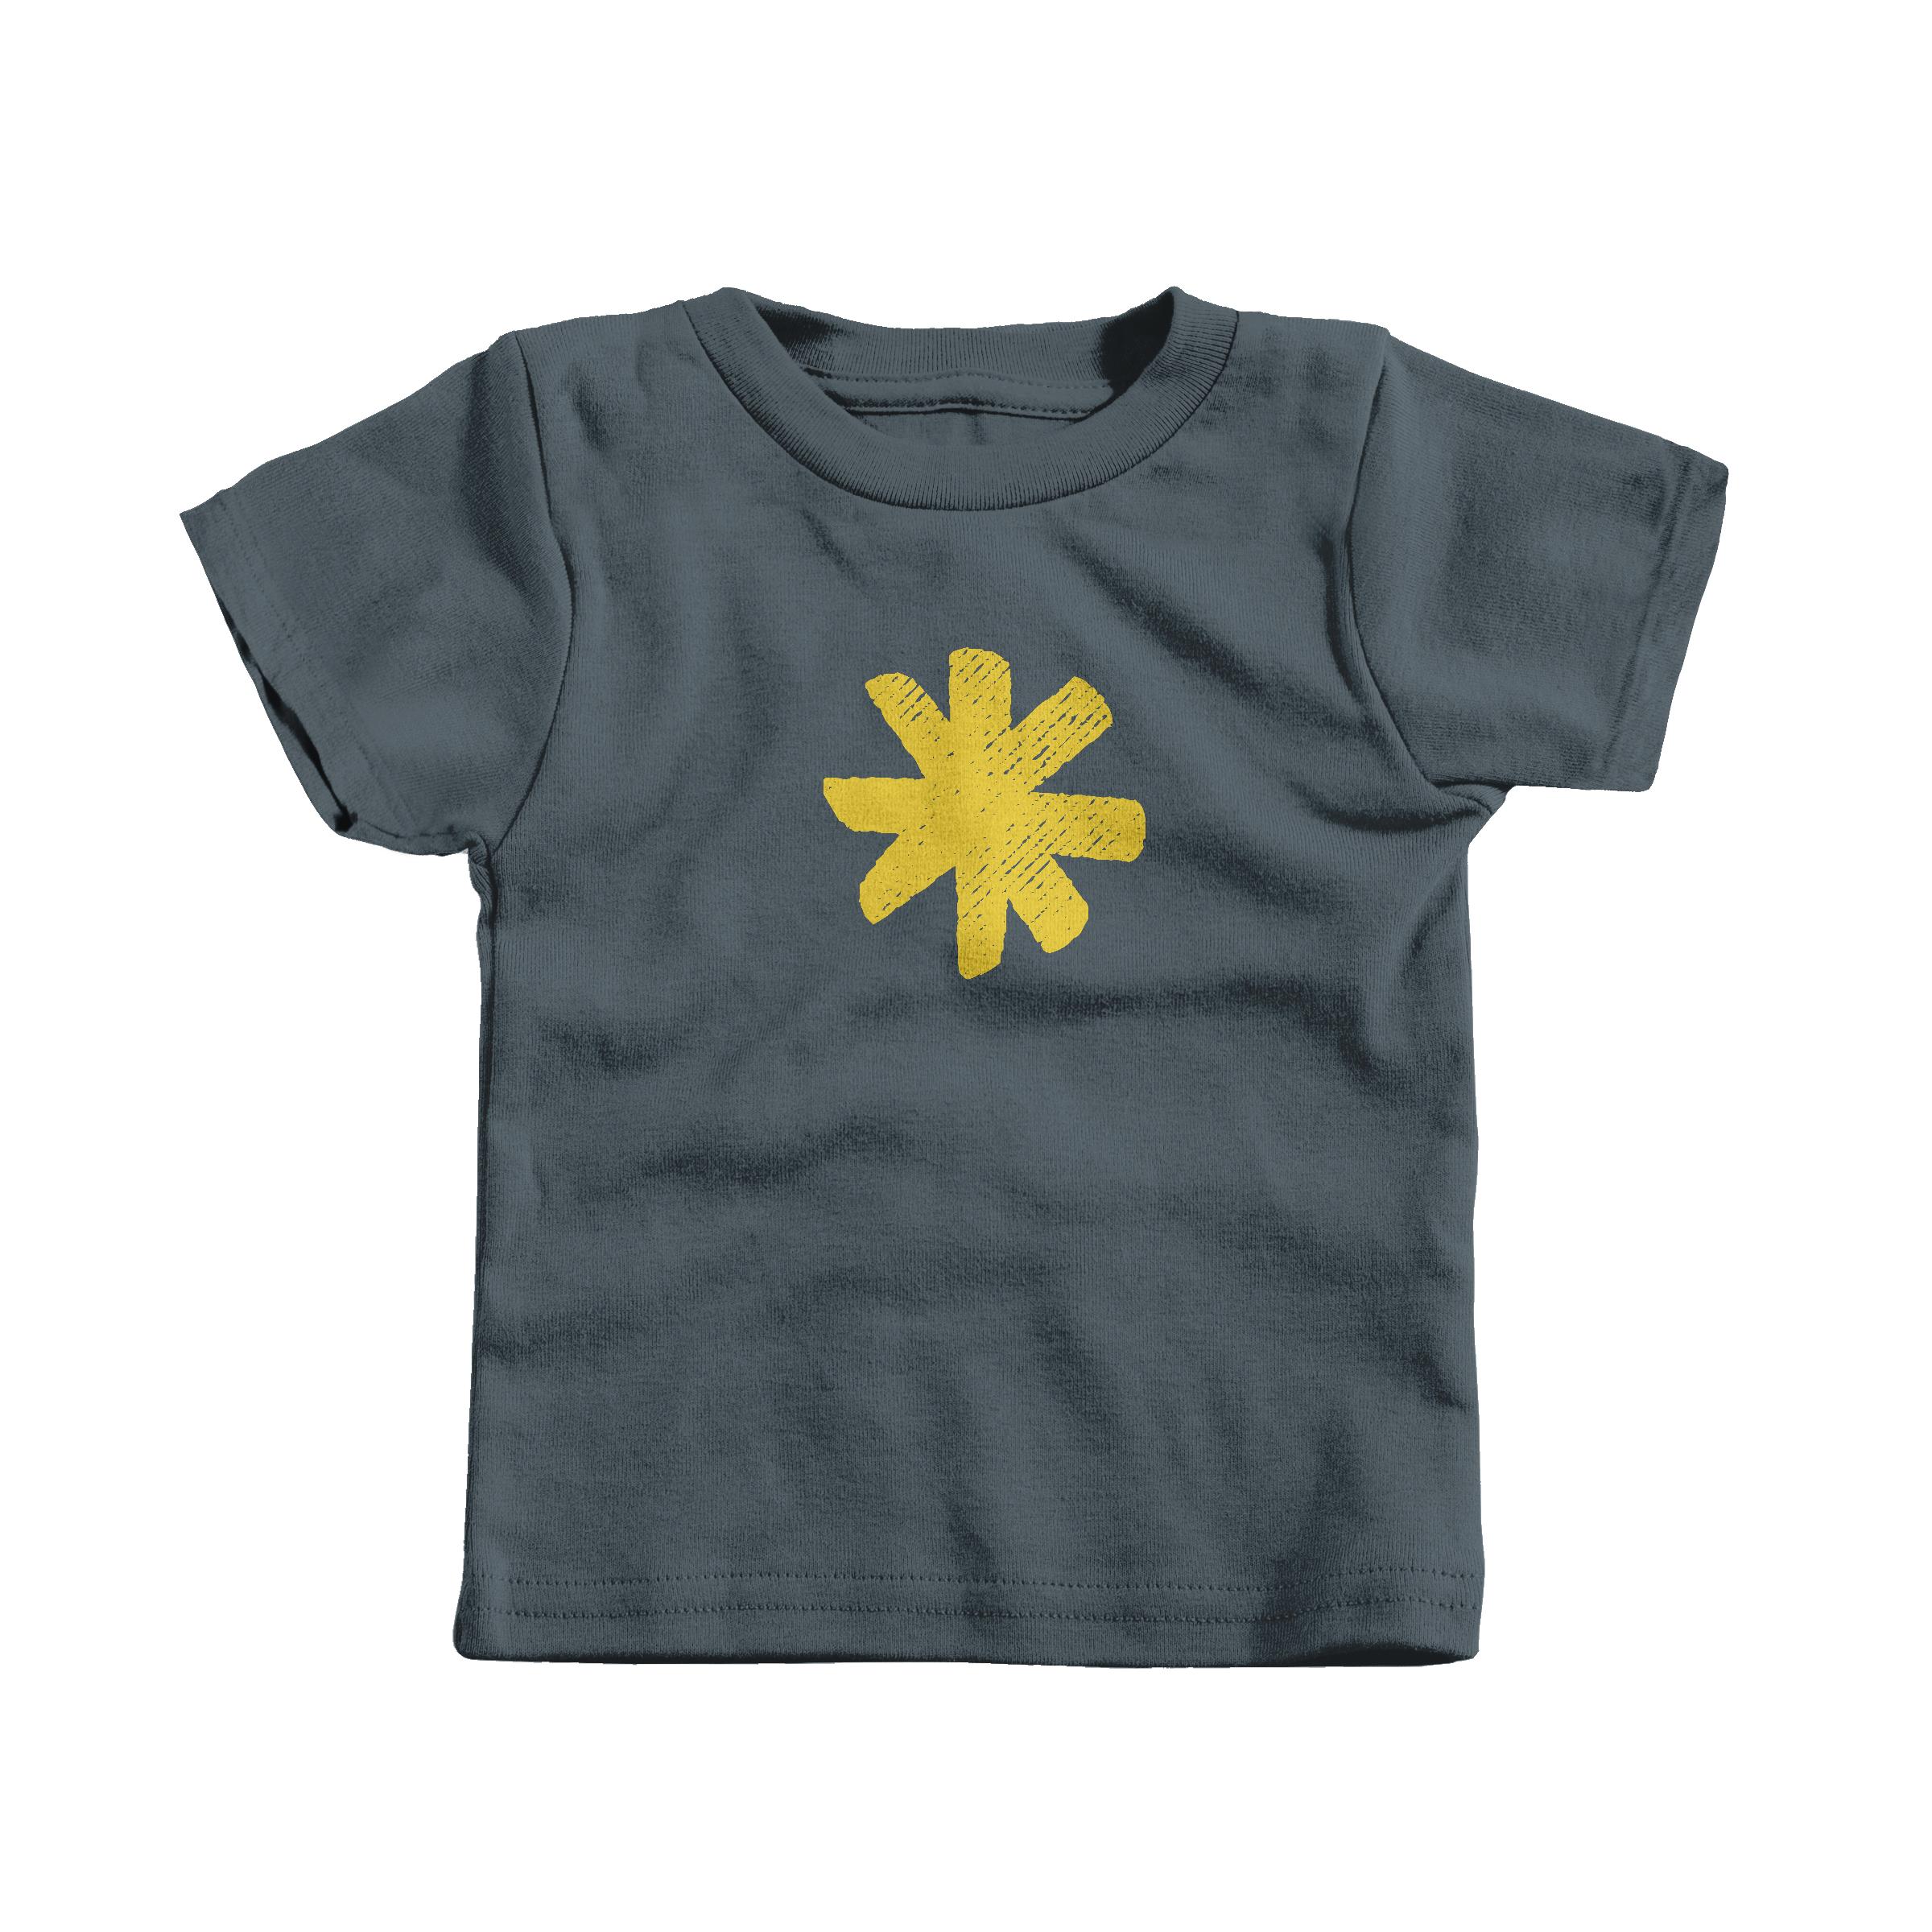 MOXIE Charcoal (T-Shirt)